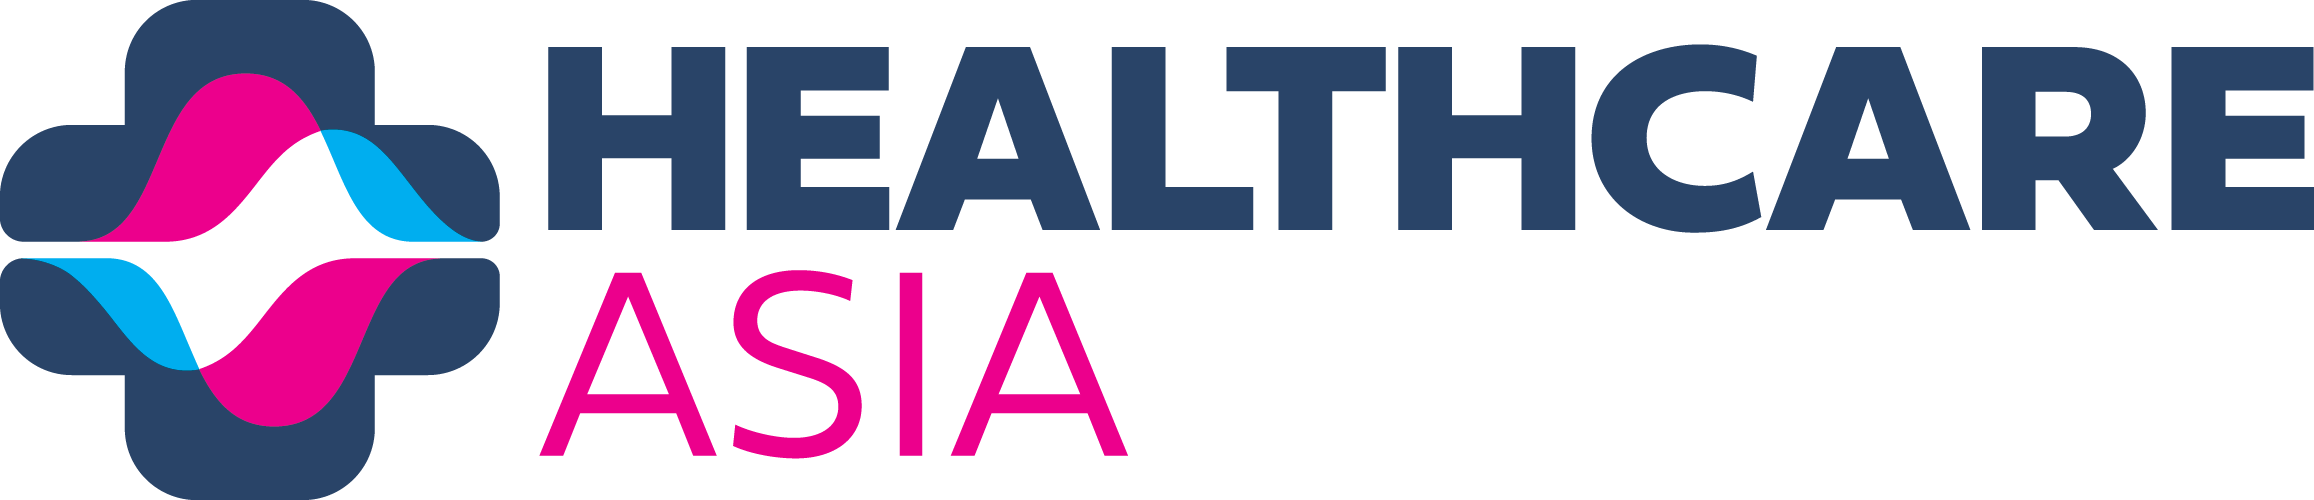 Healthcare Asia